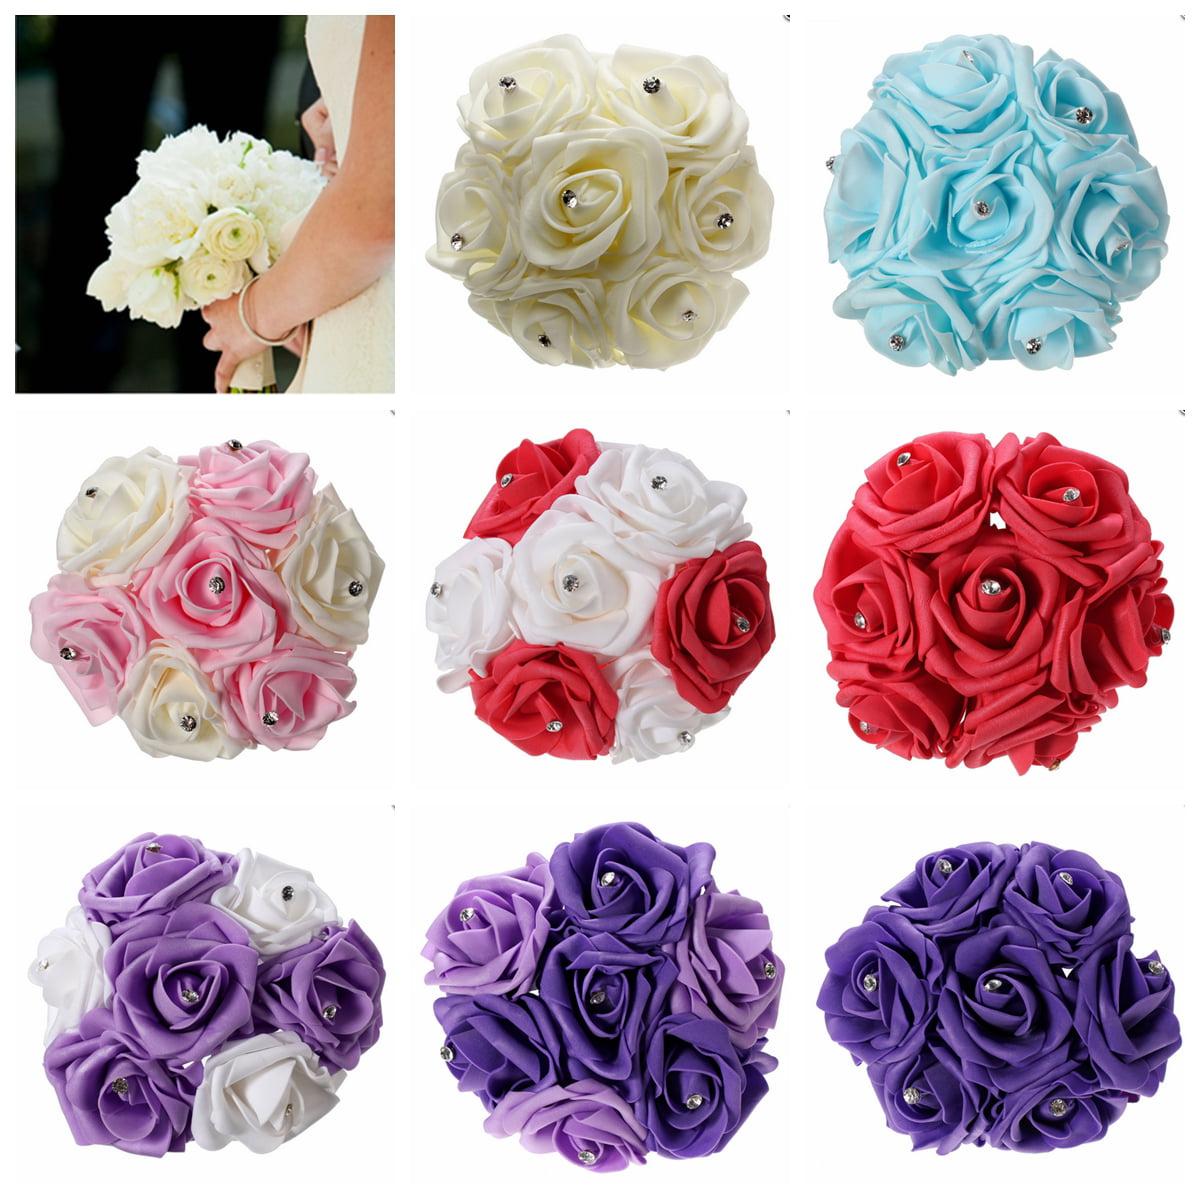 1 bunch aartificial rose flower craft flower bridal rhinestone crystal  bouquet wedding flowers party decor